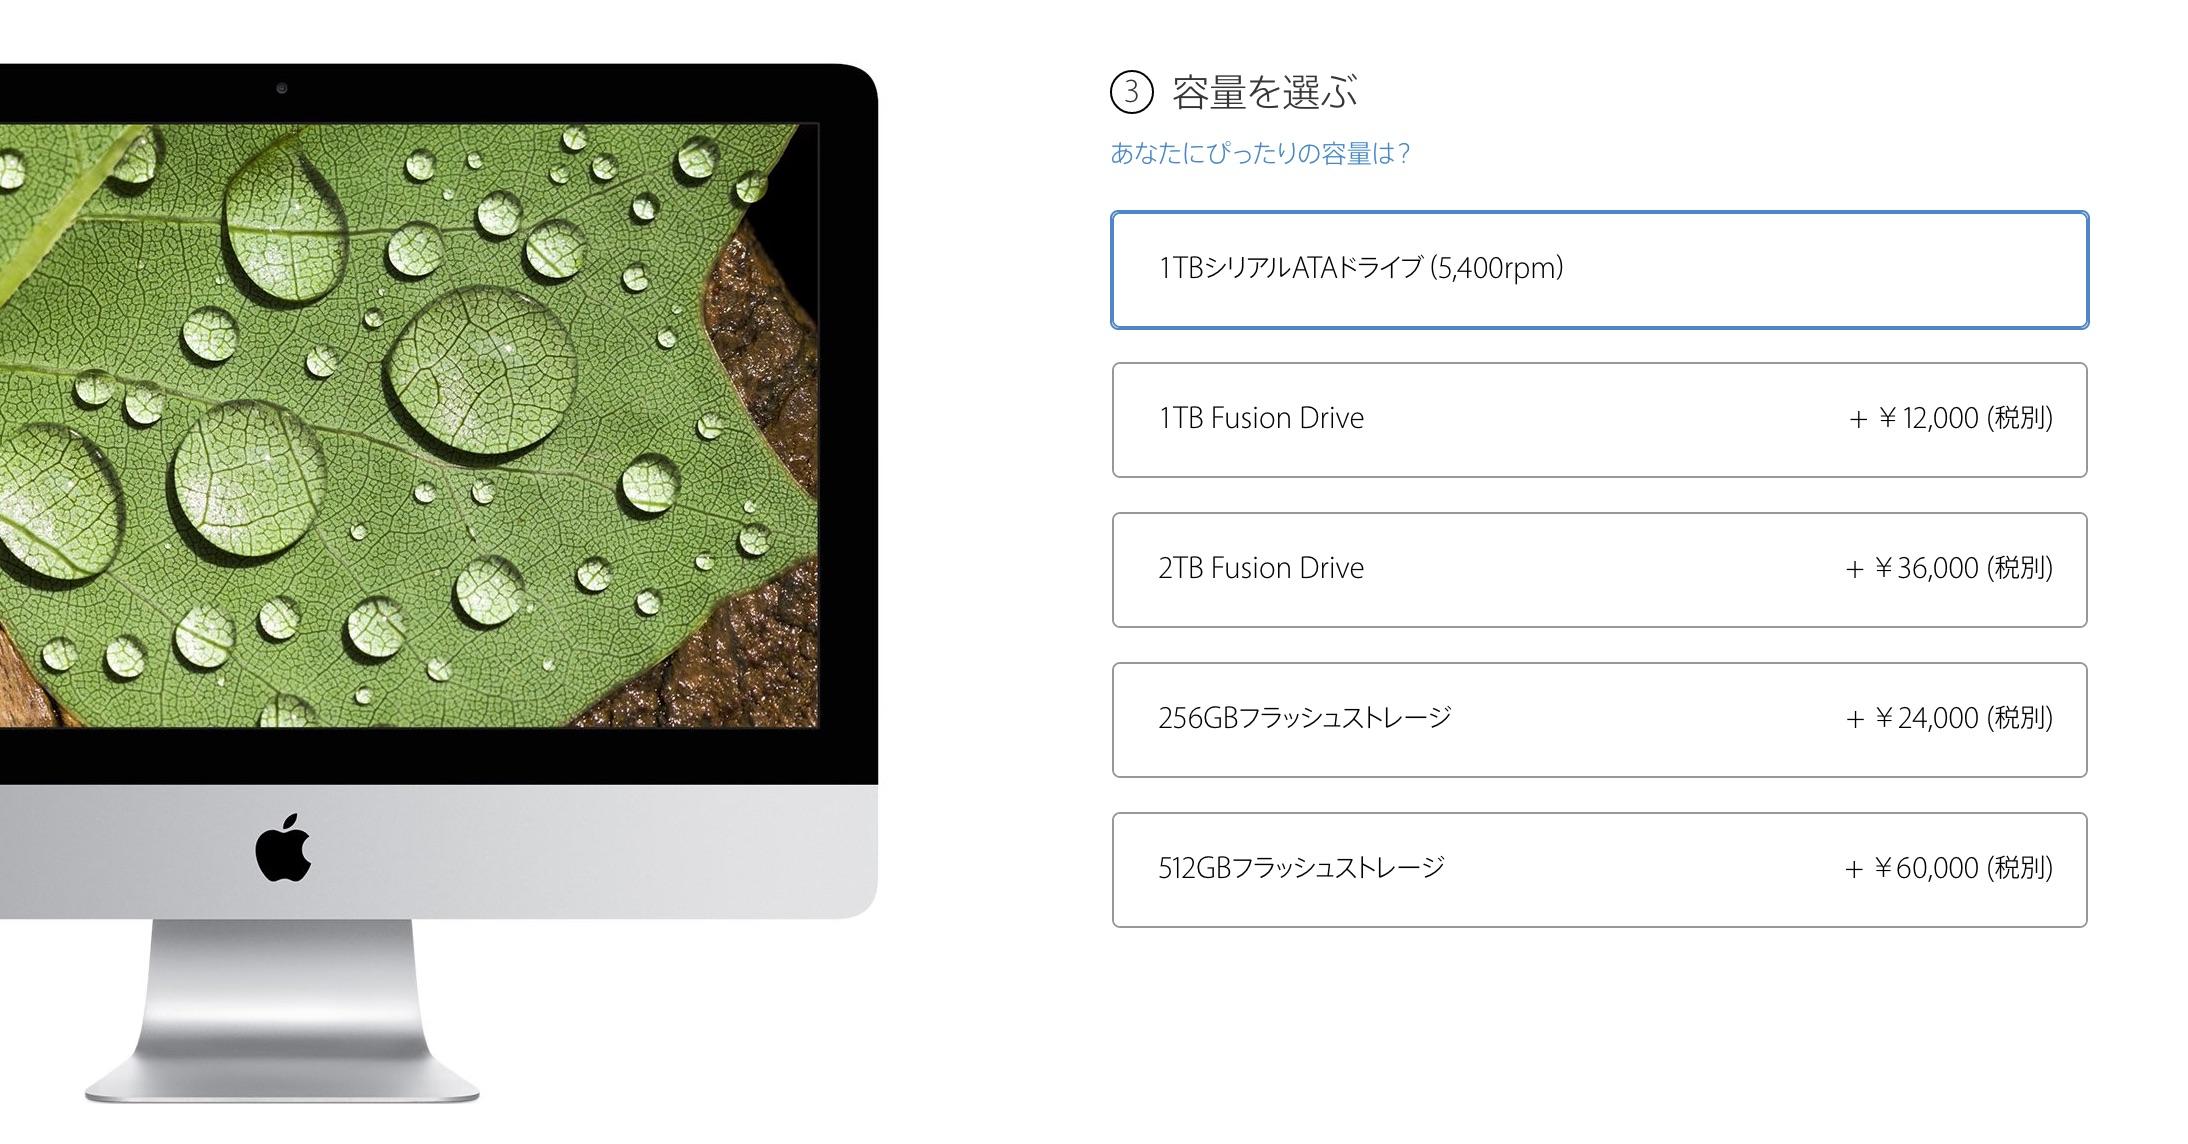 iMac-4K-Storage-Option